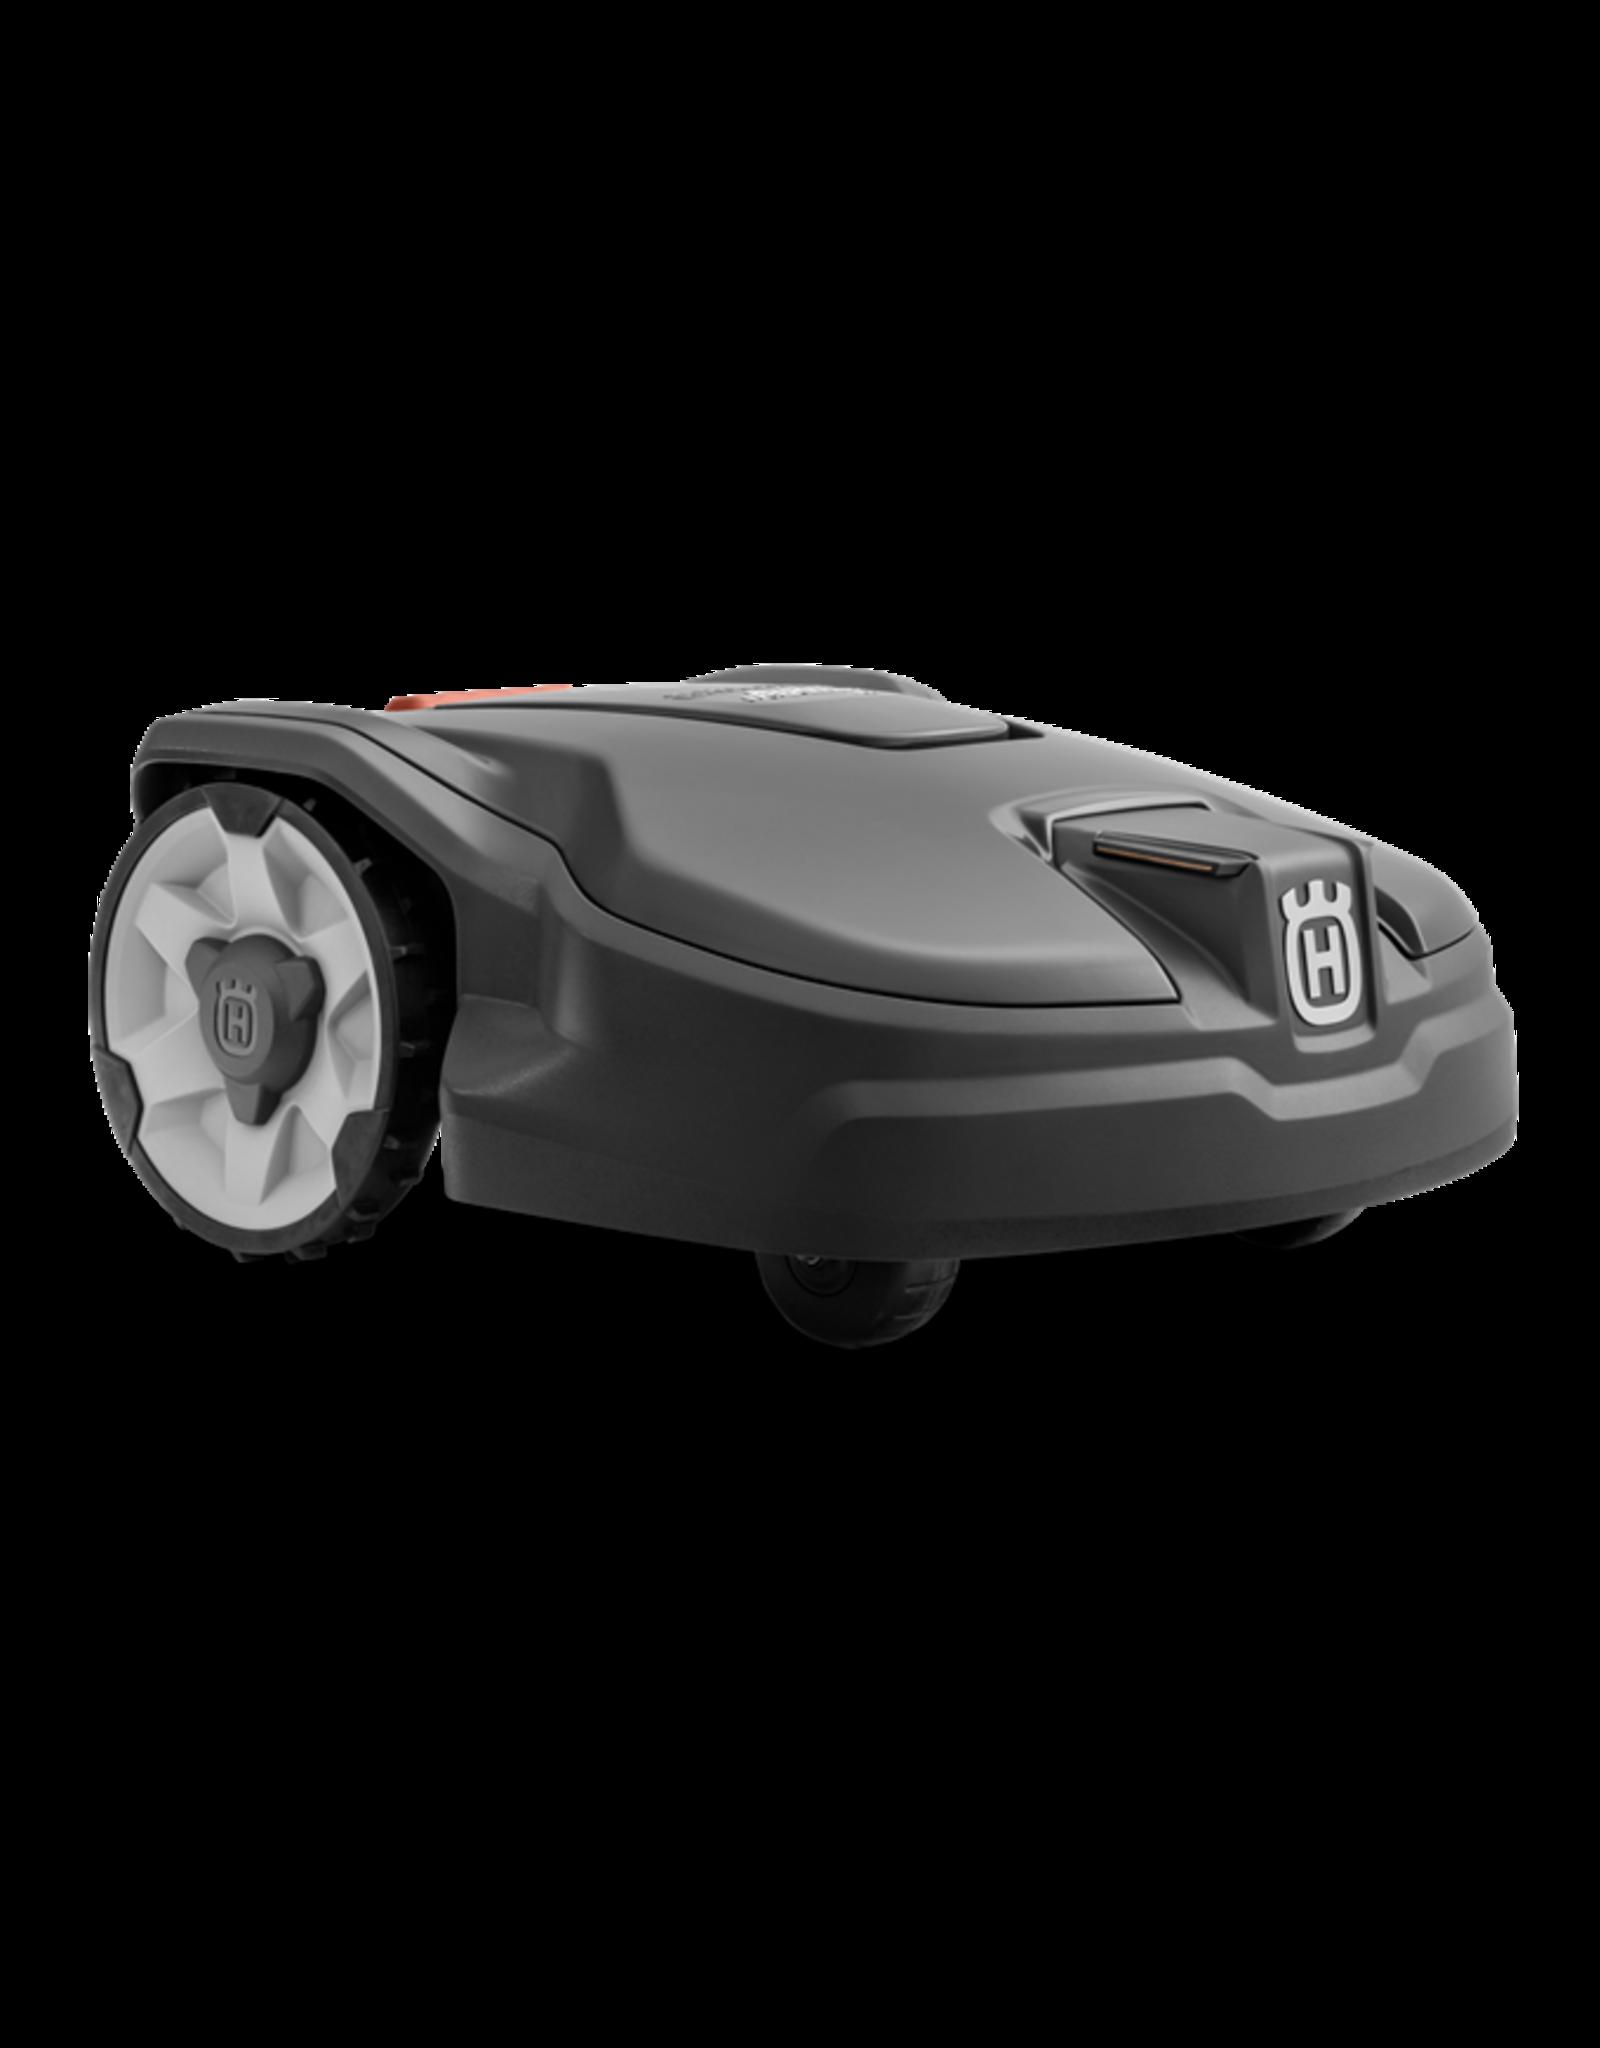 Husqvarna Husqvarna Automower® 305